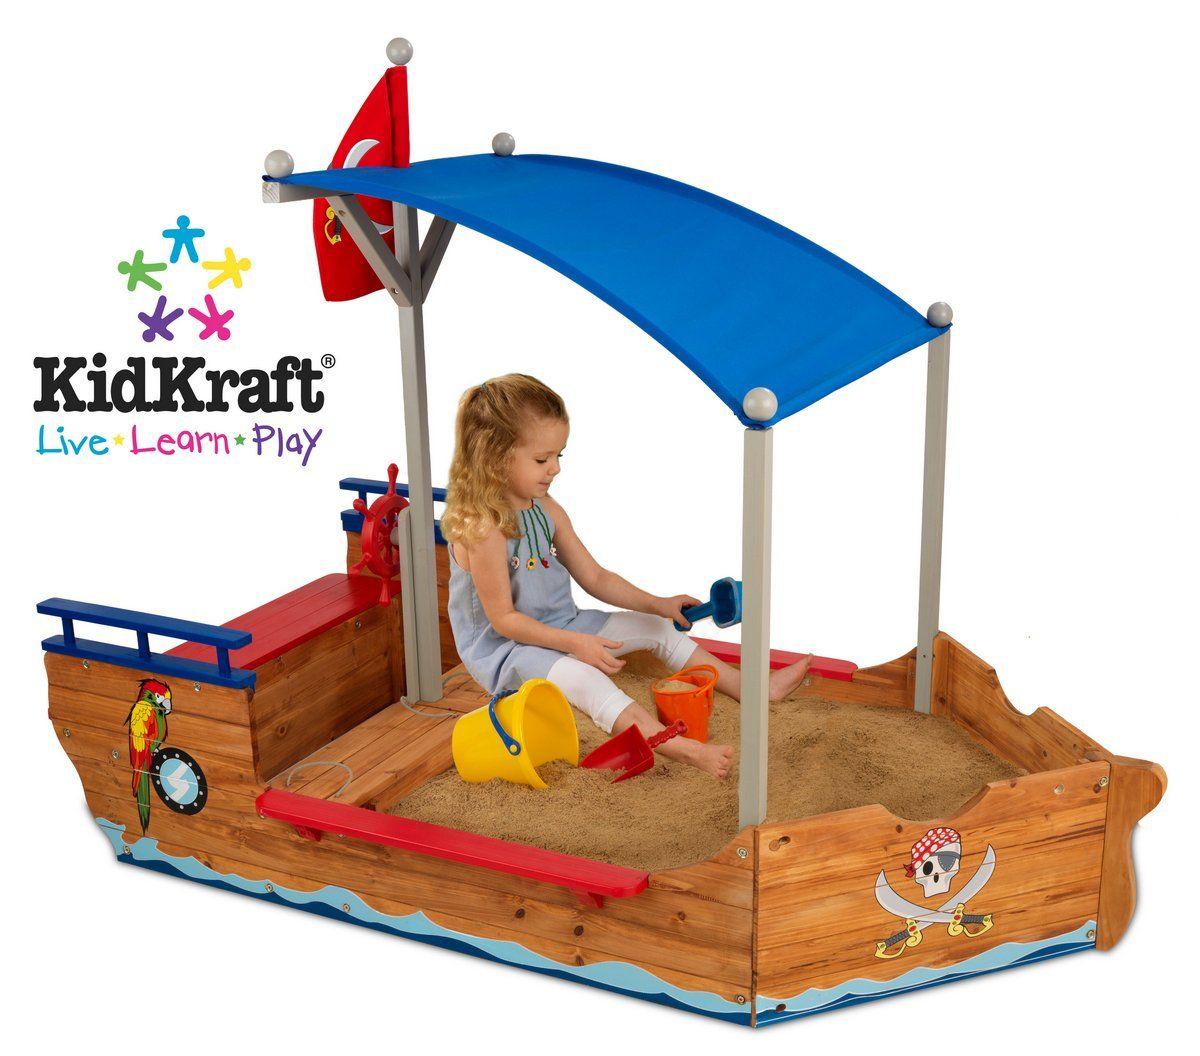 Pirate Sand Boat KidKraft 00128 Kids sandbox, Wooden